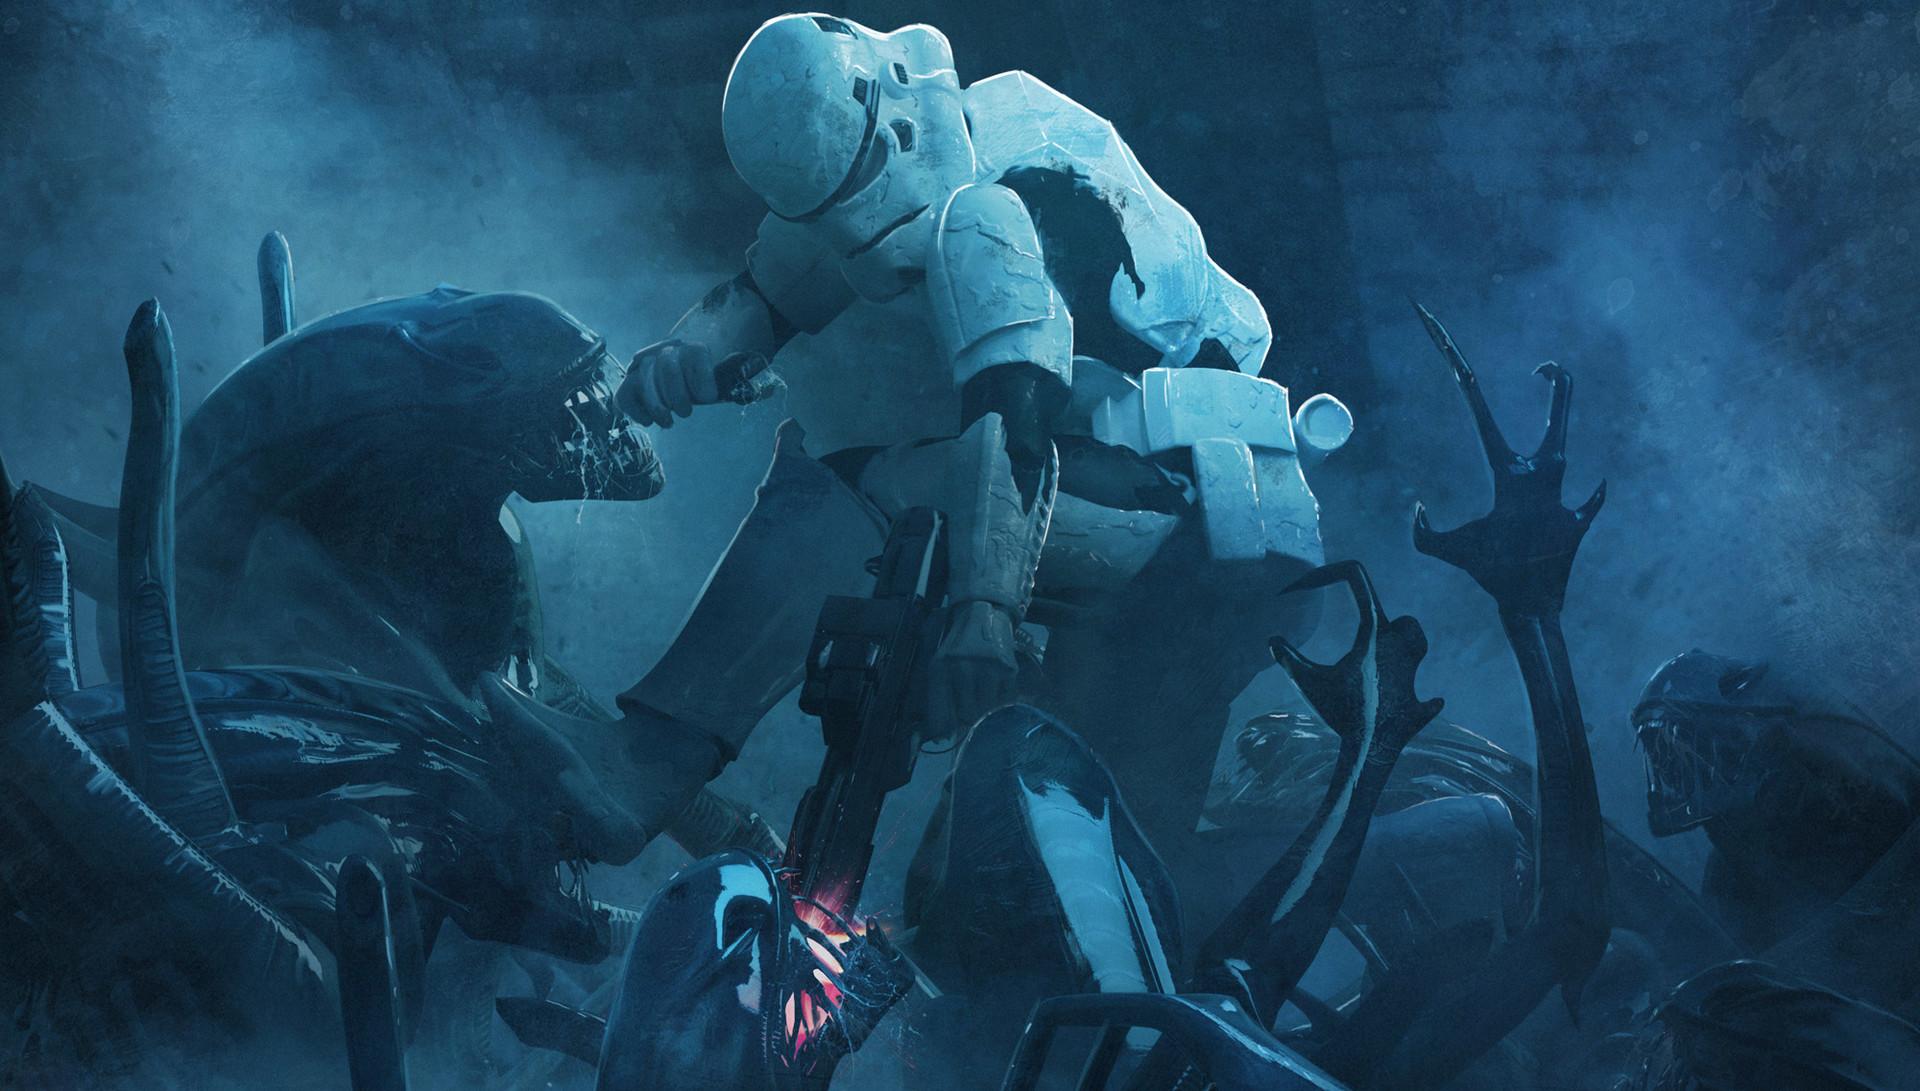 Guillem h pongiluppi guillemhp 501 legion stormtroopers vs aliens detail 1 detail